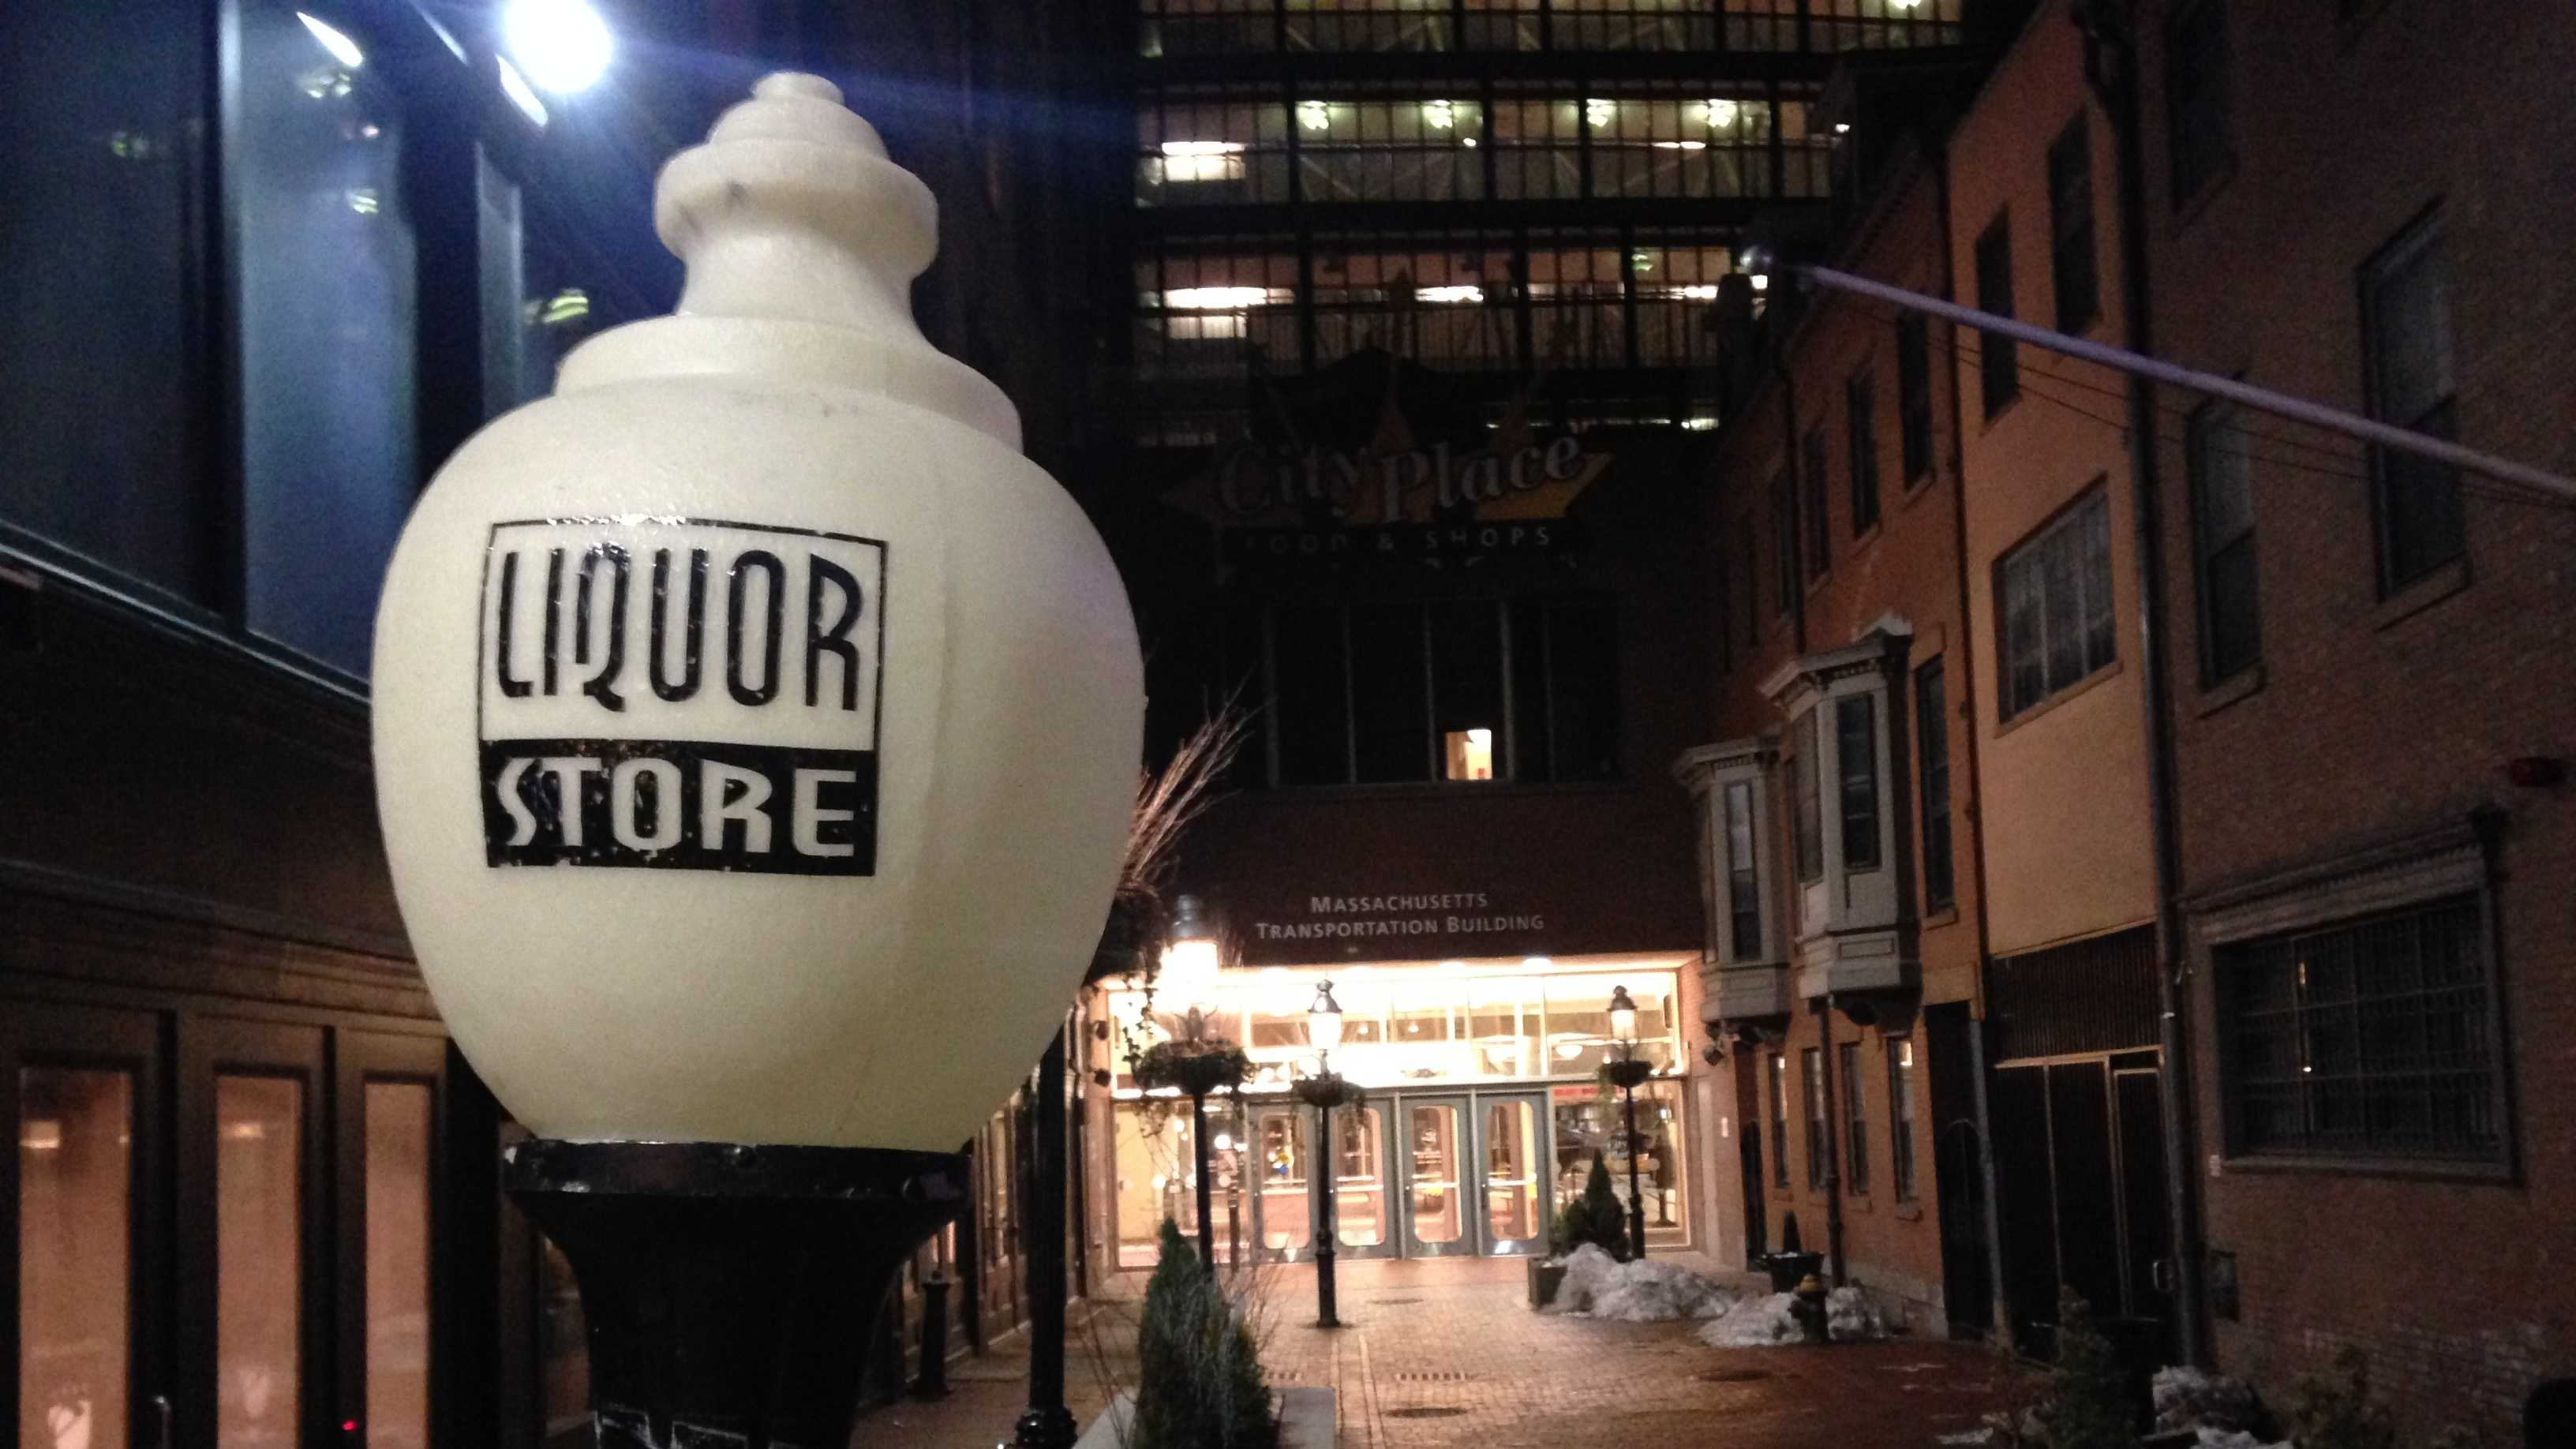 Liquor Store Nightclub 3.2.14